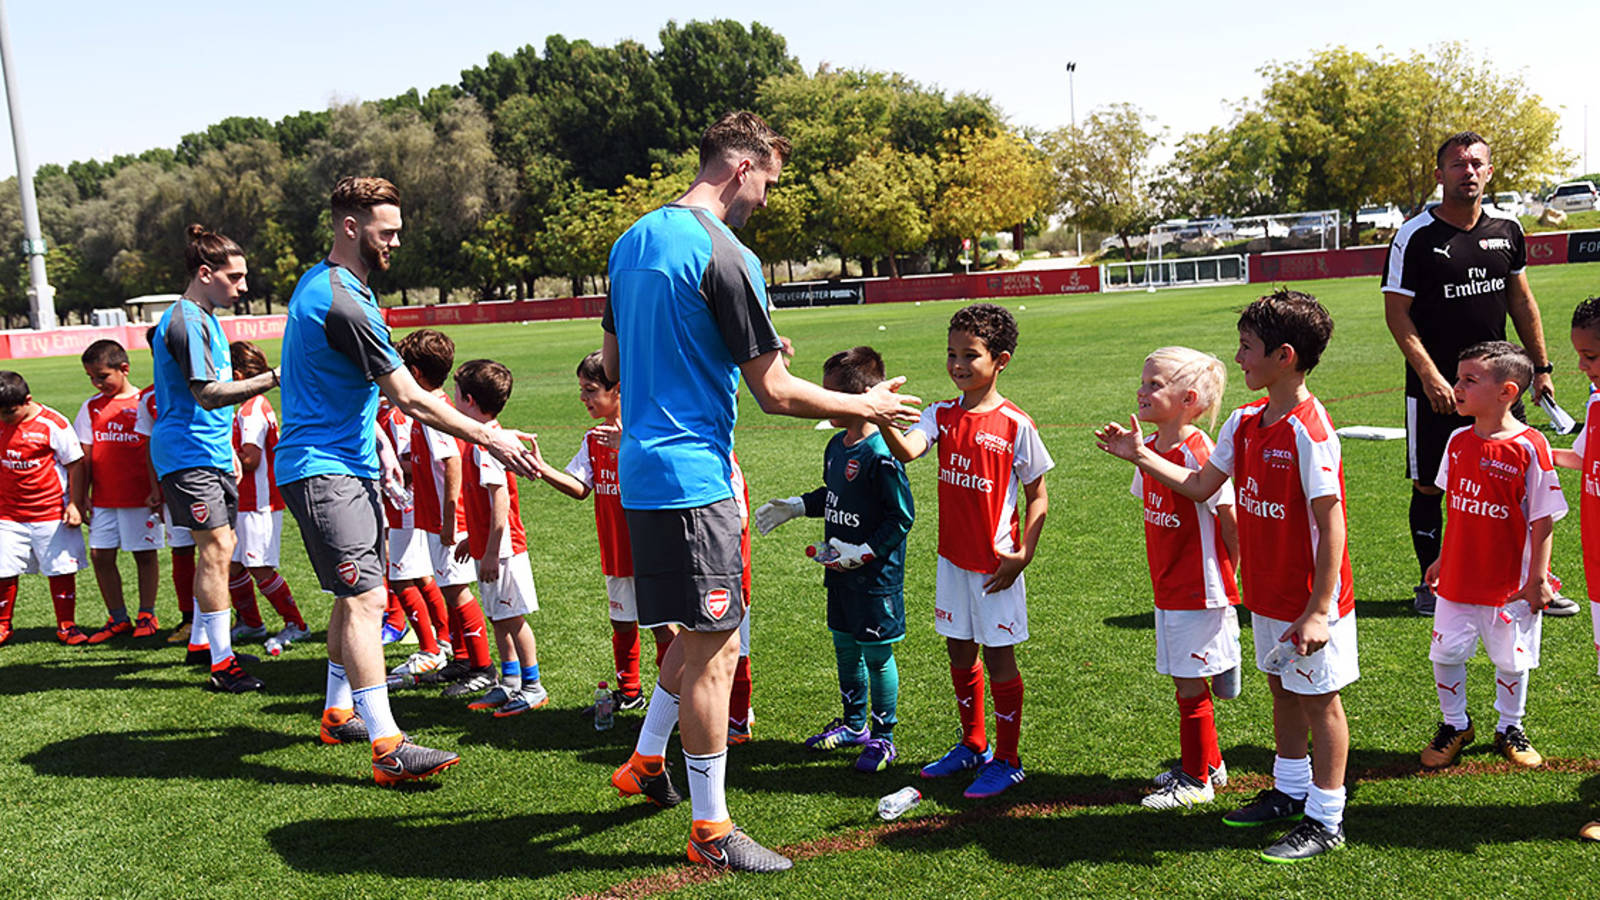 Arsenal Soccer School Dubai Opens For New Term The Club News Arsenal Com